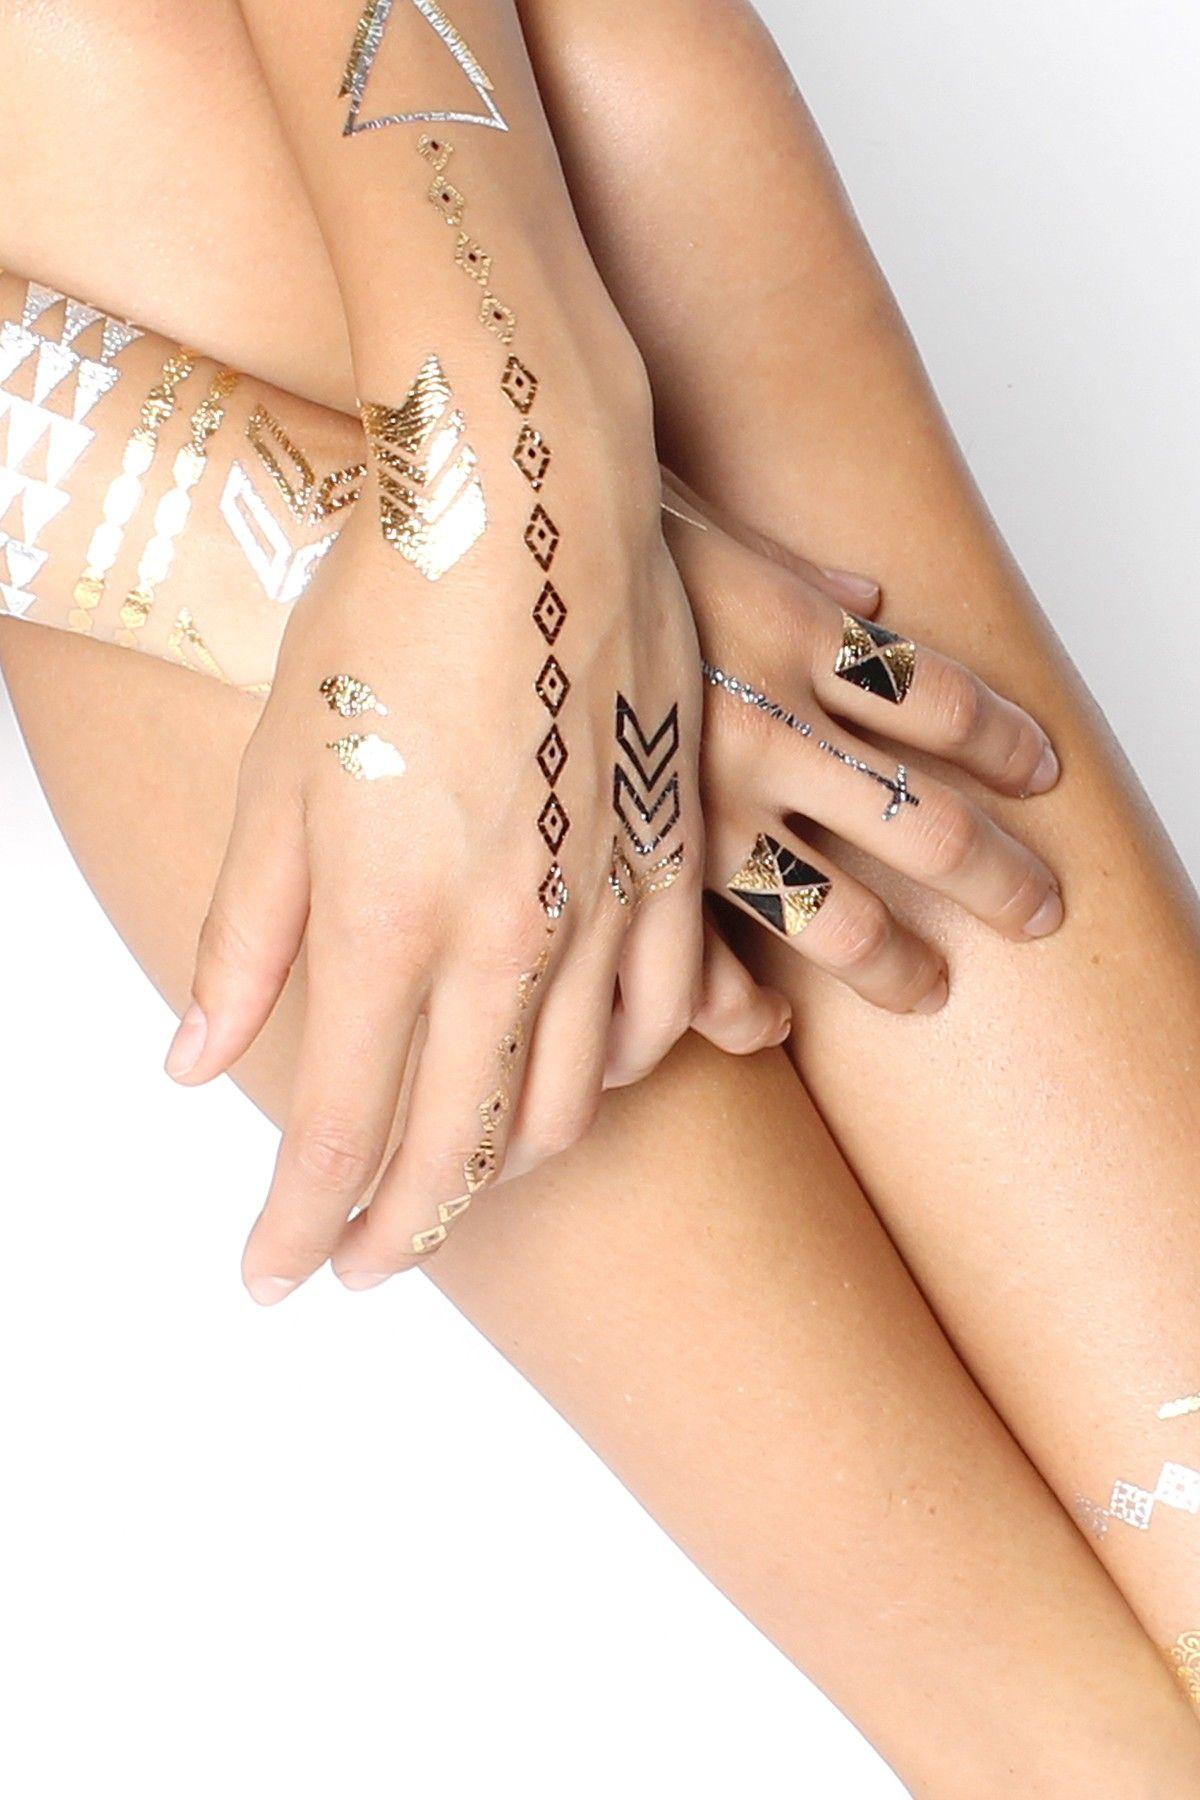 Tattoos for men ring infinite love temporary metallic tattoos  put it on  pinterest